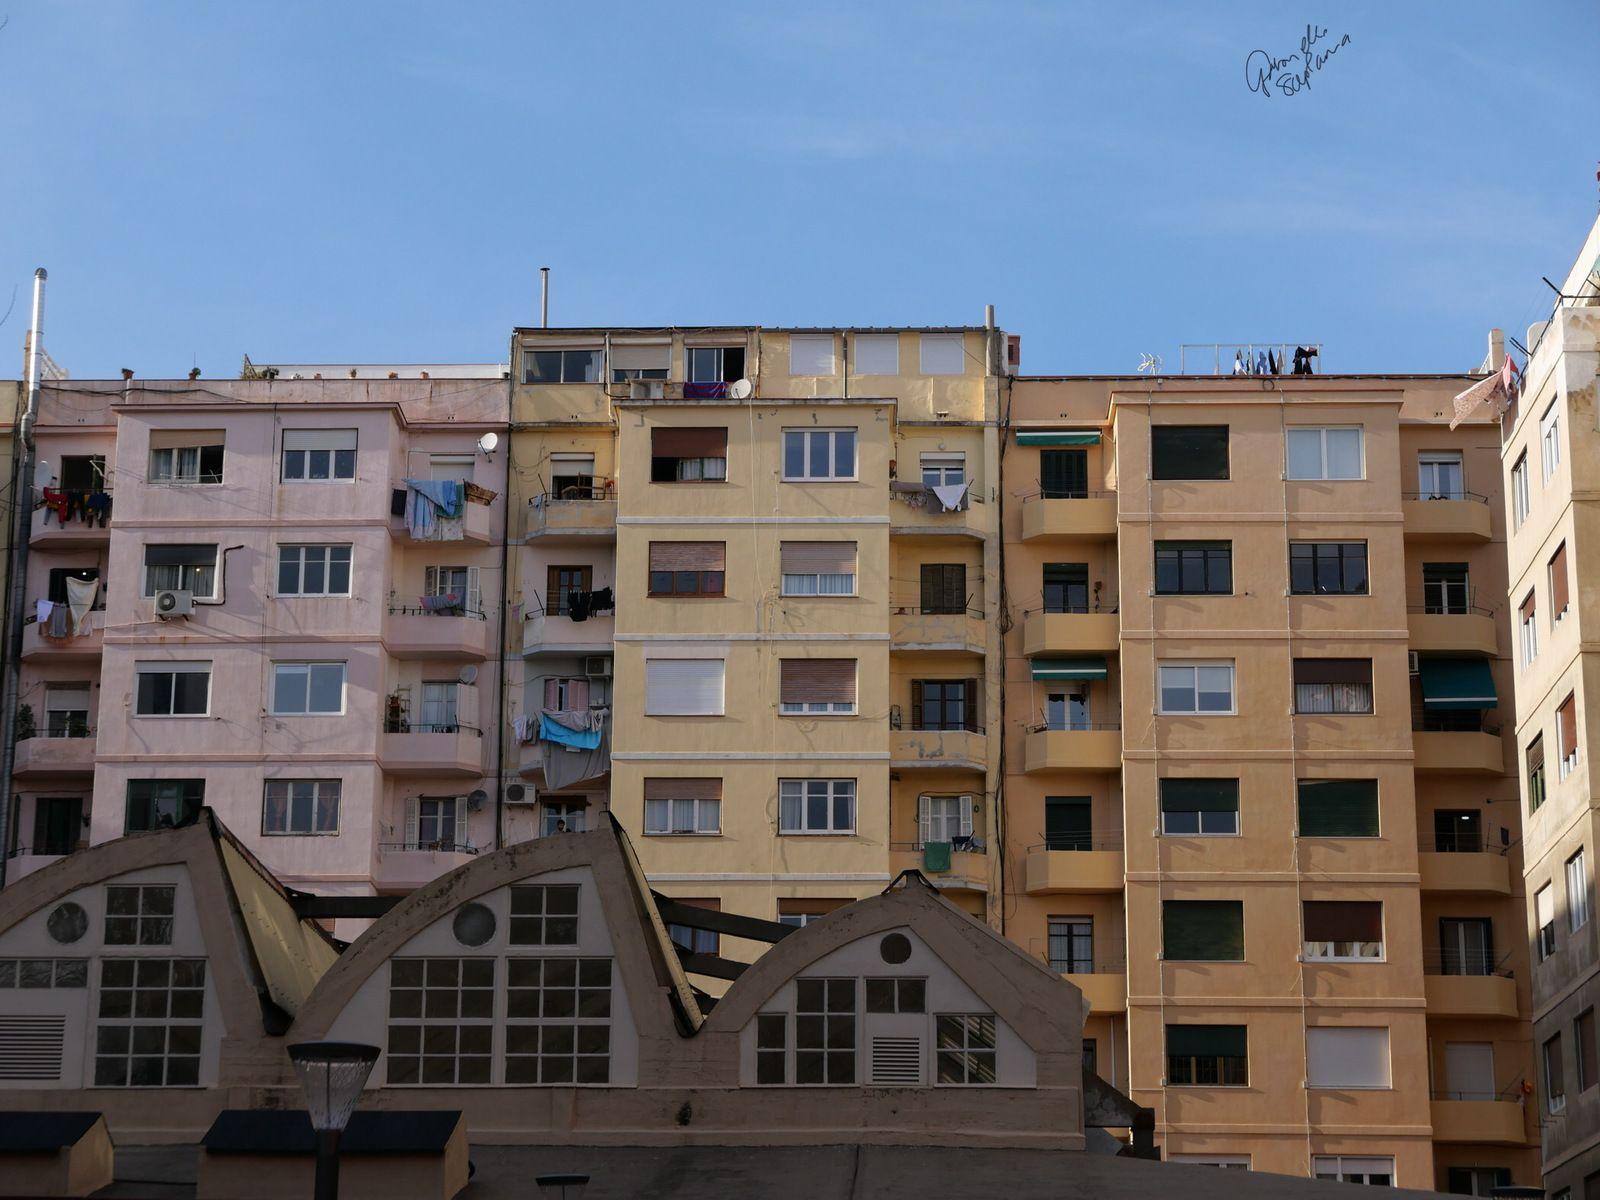 Barcelona, 01/2021